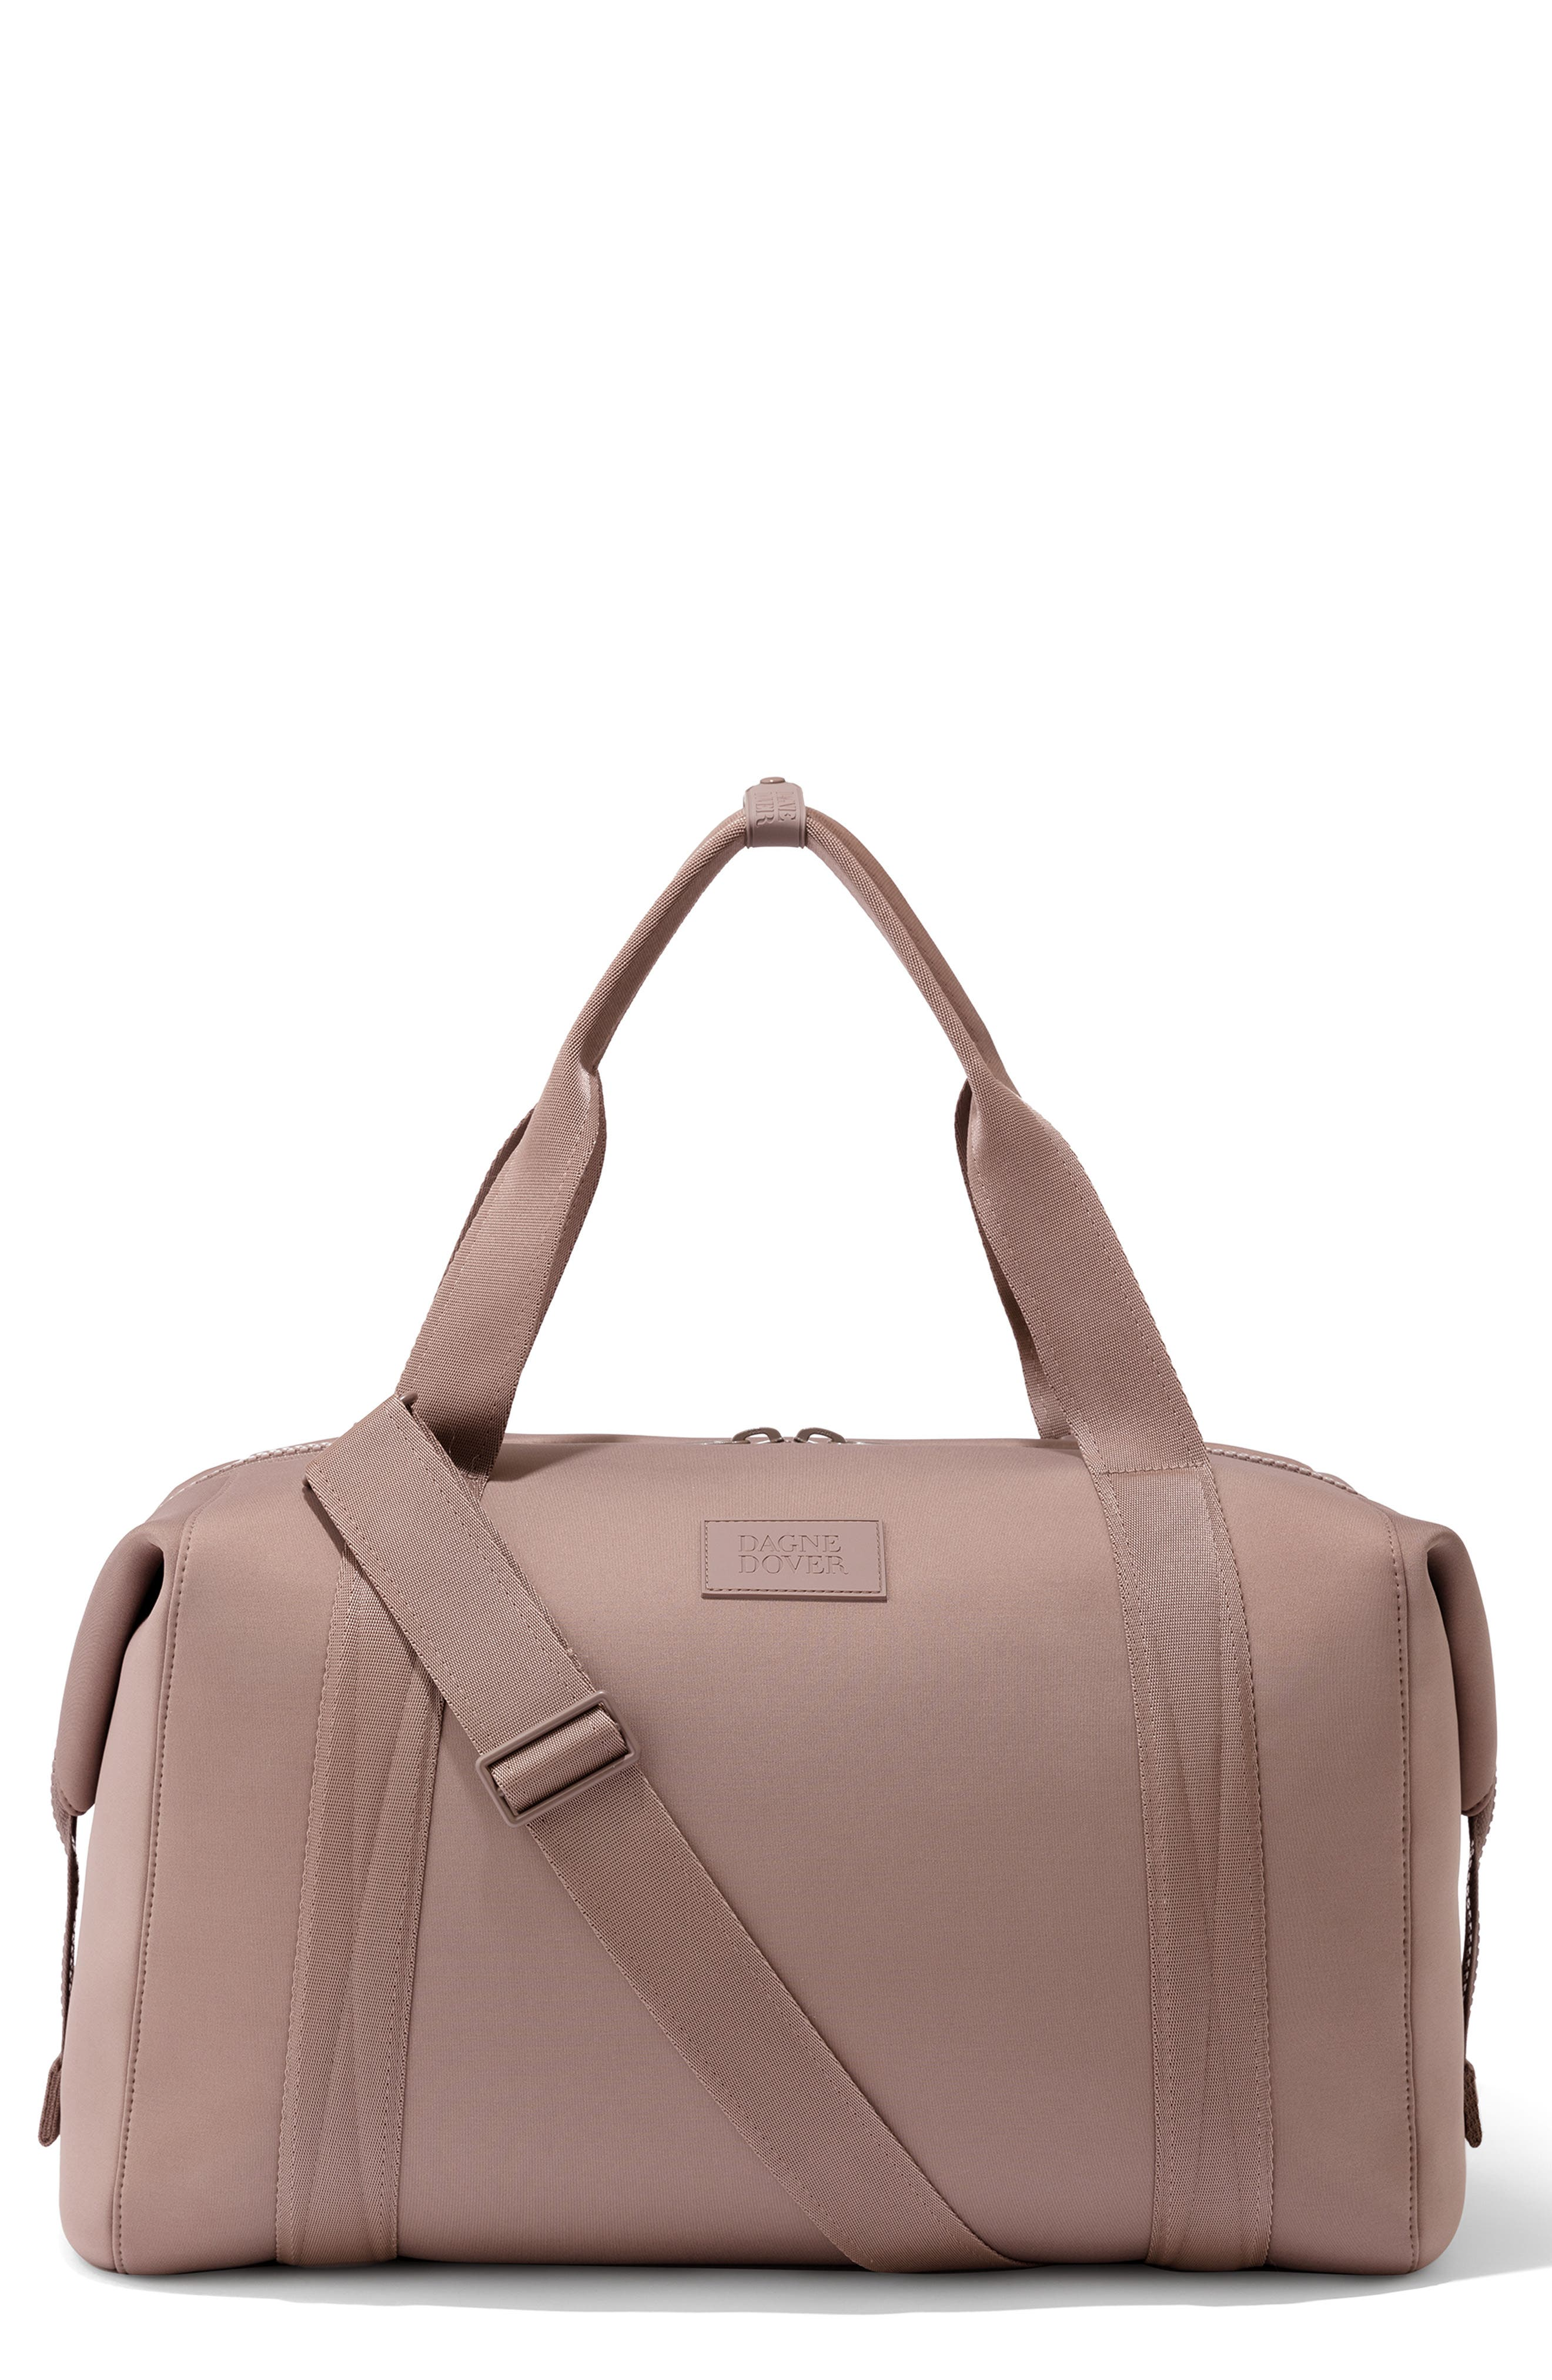 DAGNE DOVER Xl Landon Carryall Duffel Bag - Pink in Dune